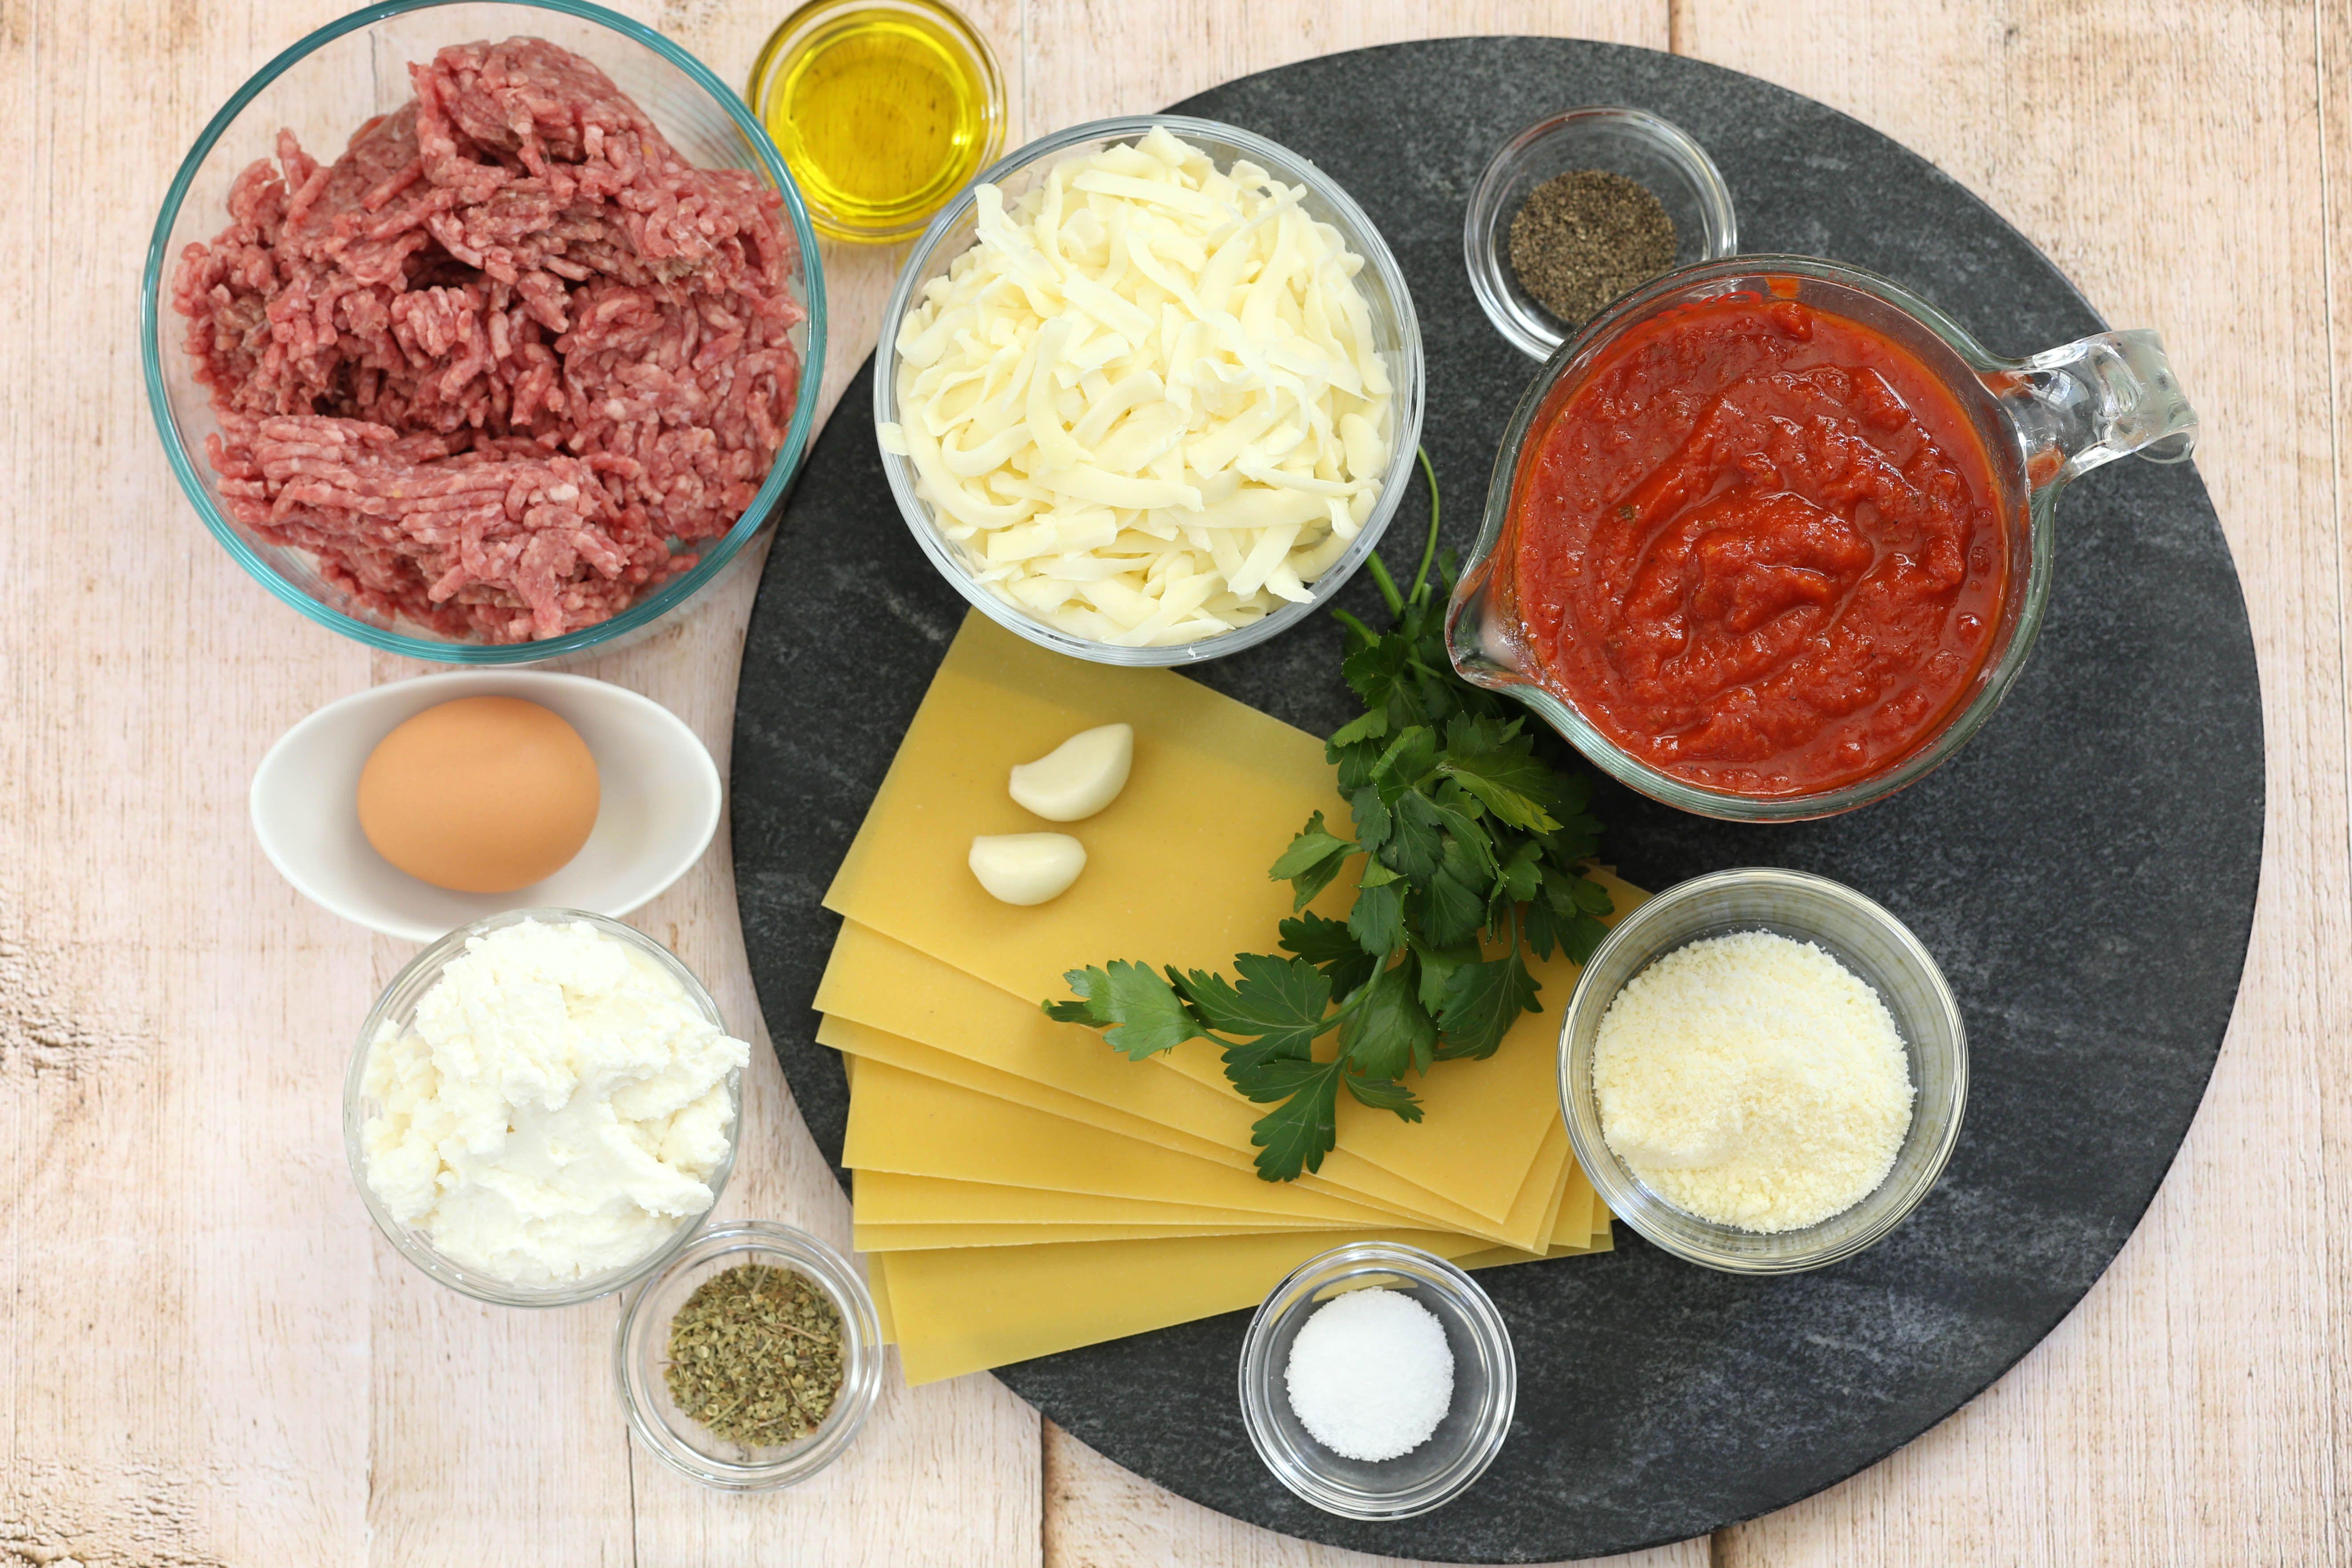 Ingredients for Instant Pot lasagna.